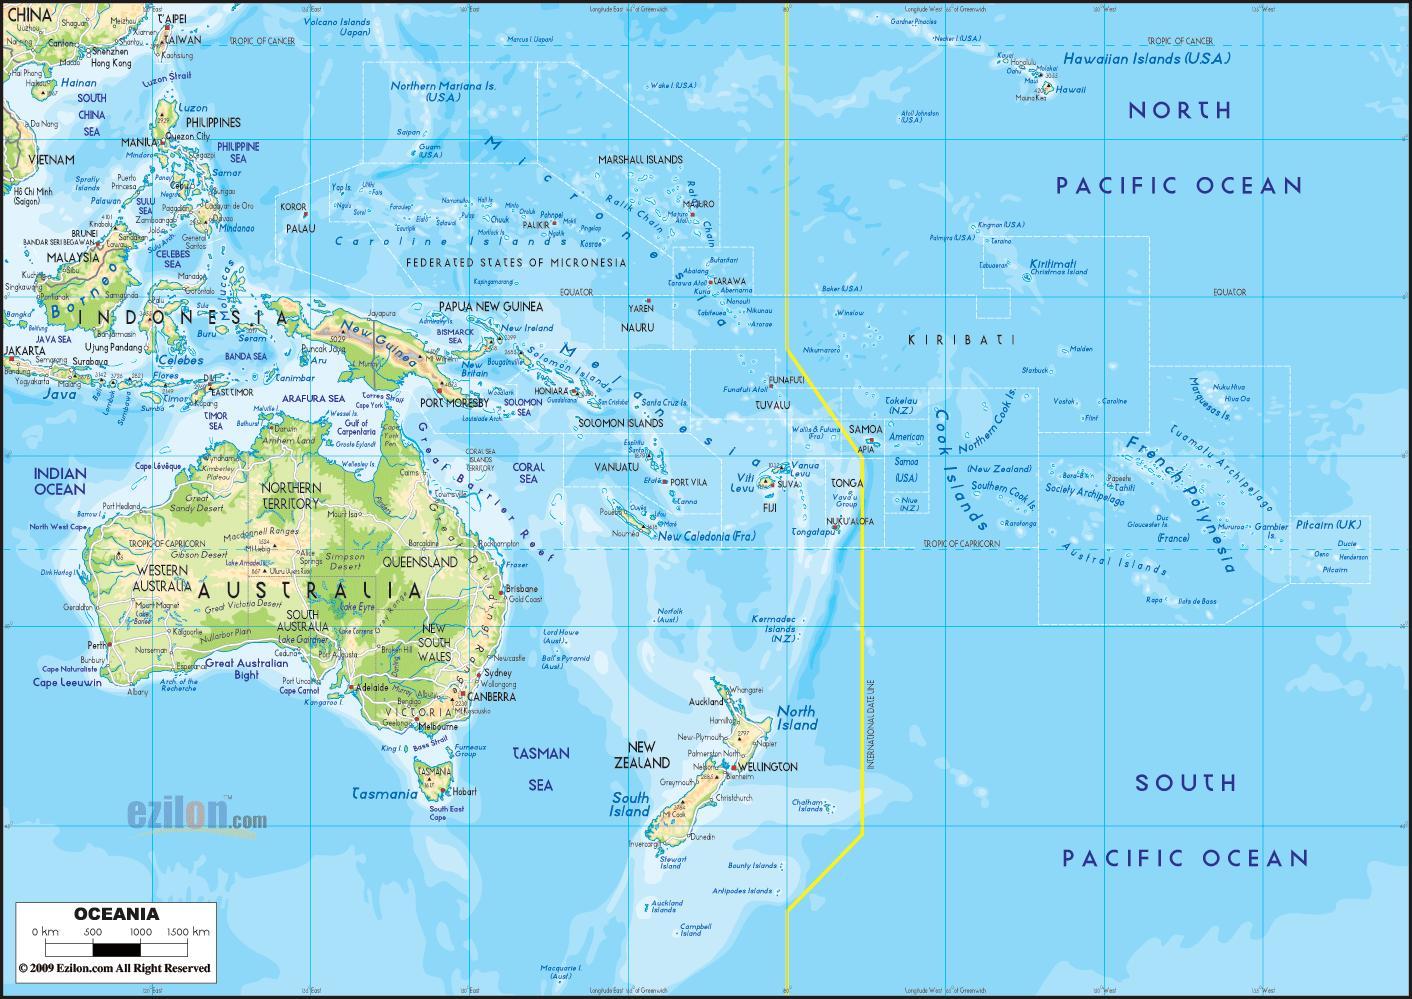 kart oseania Oceania Australia kart   Australia og oceania kart (Australia og  kart oseania